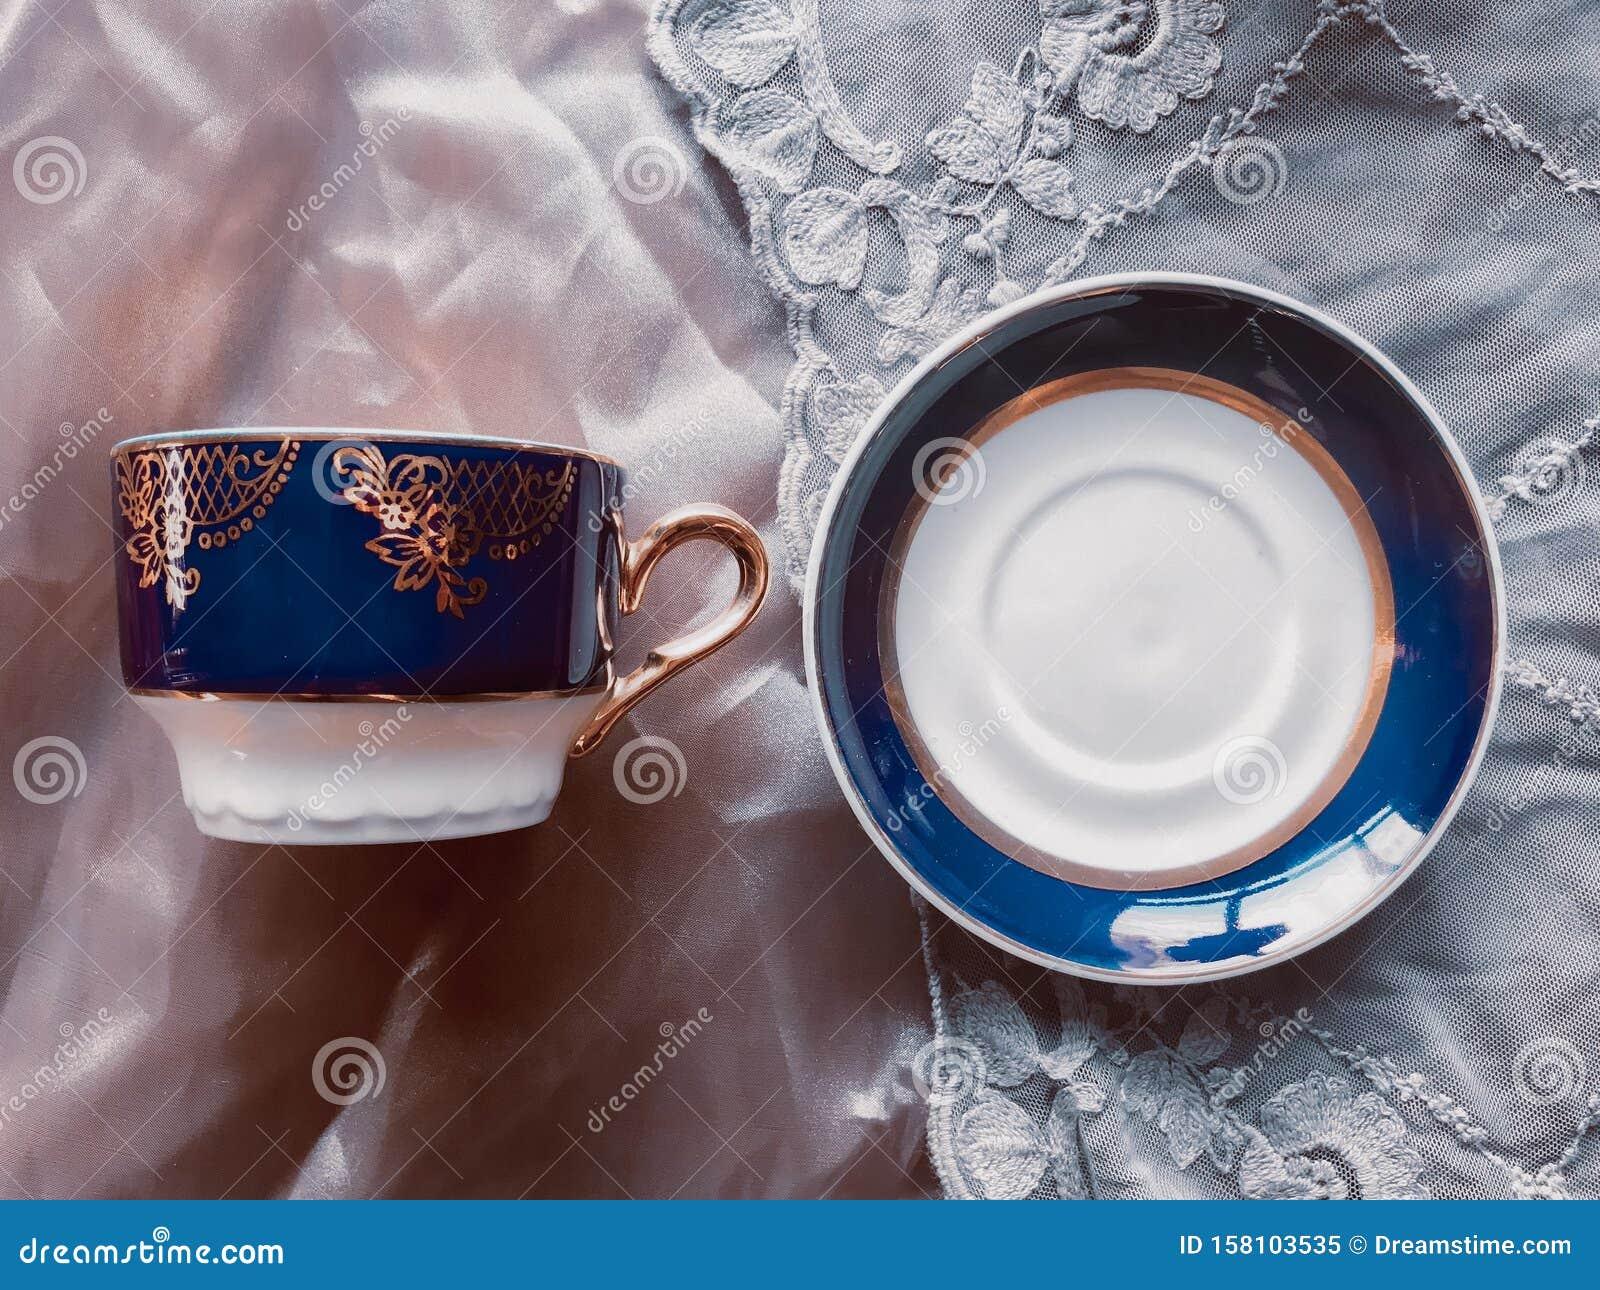 Old china tea set